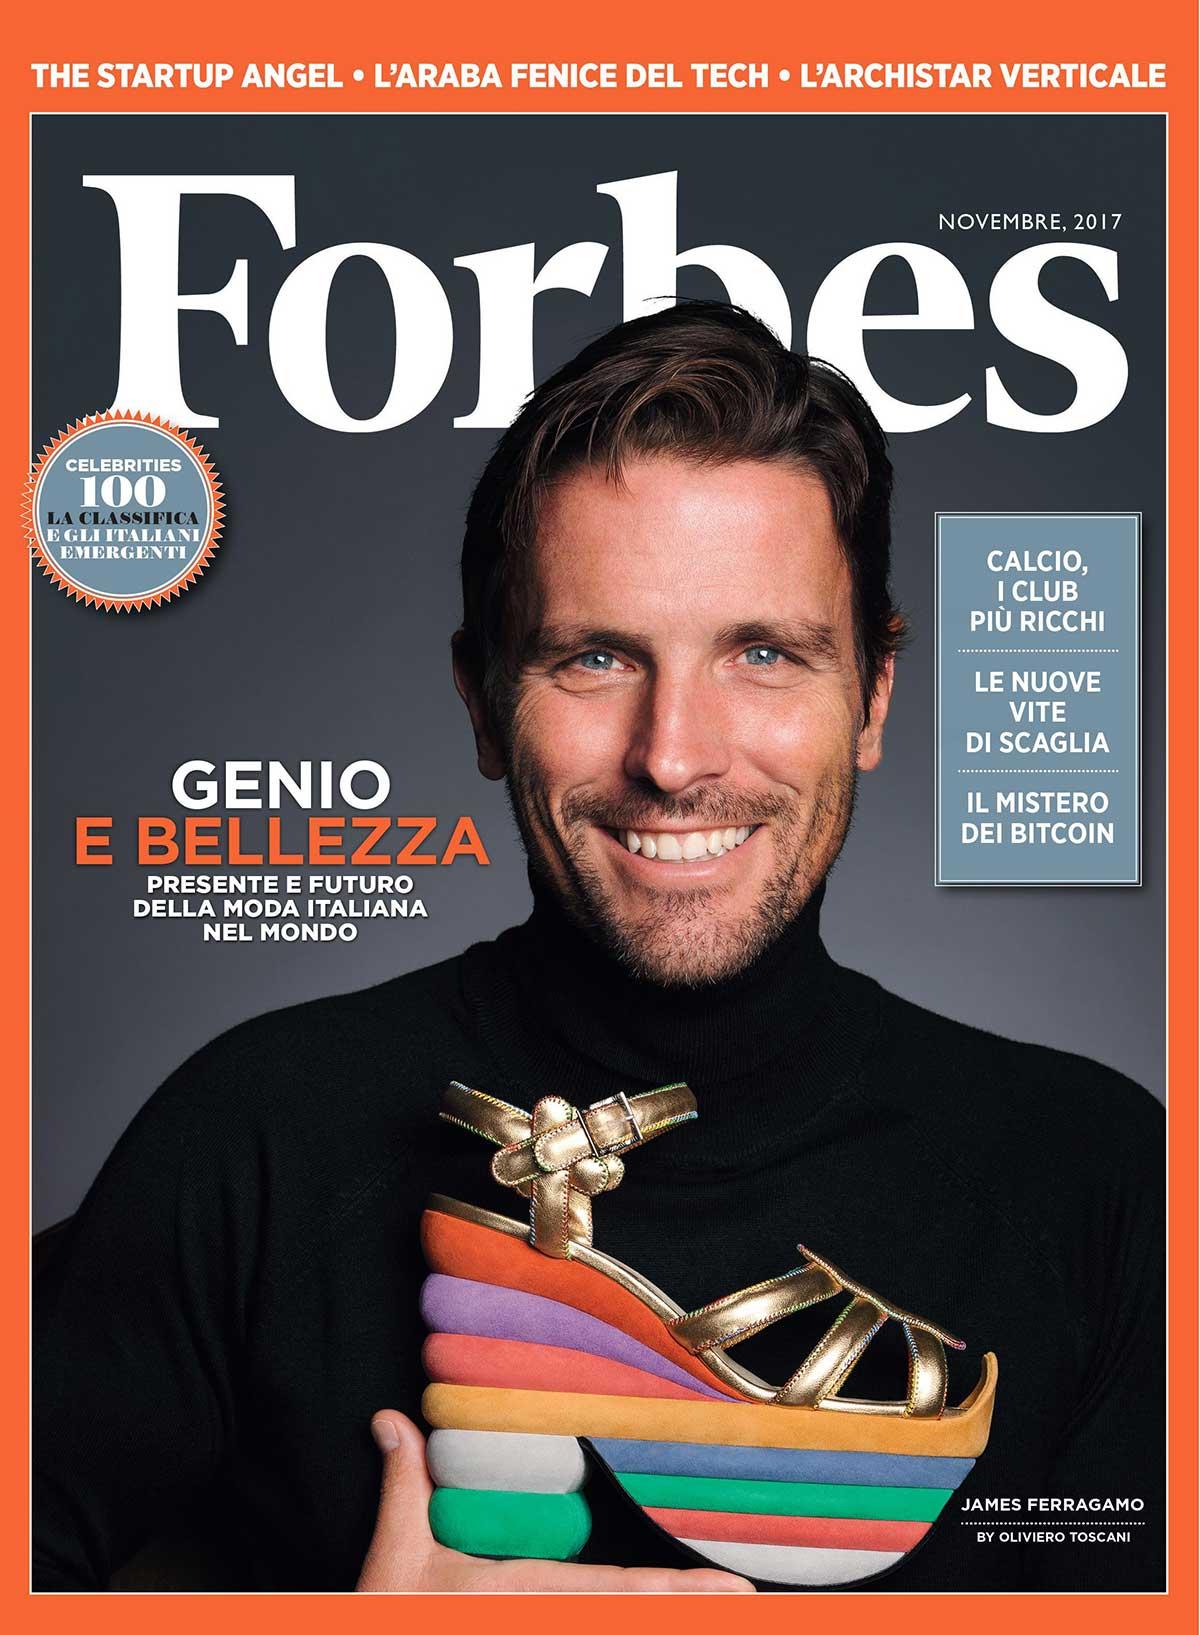 ClubDealOnline Forbes Antonio Chiarello